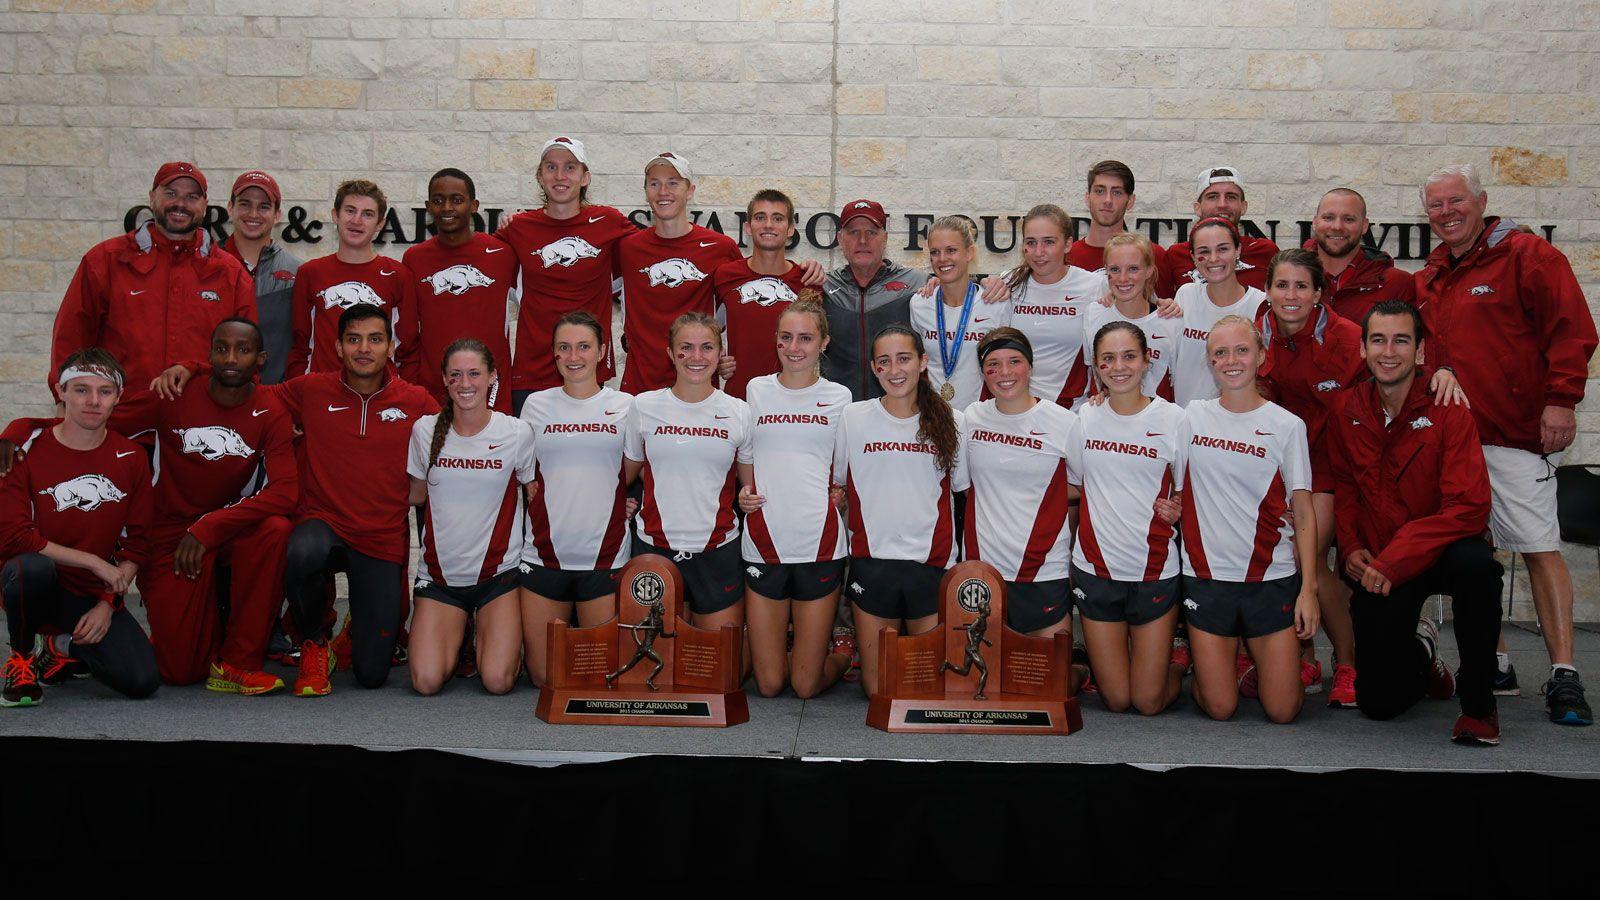 Arkansas Wins 2015 Sec Cross Country Championship